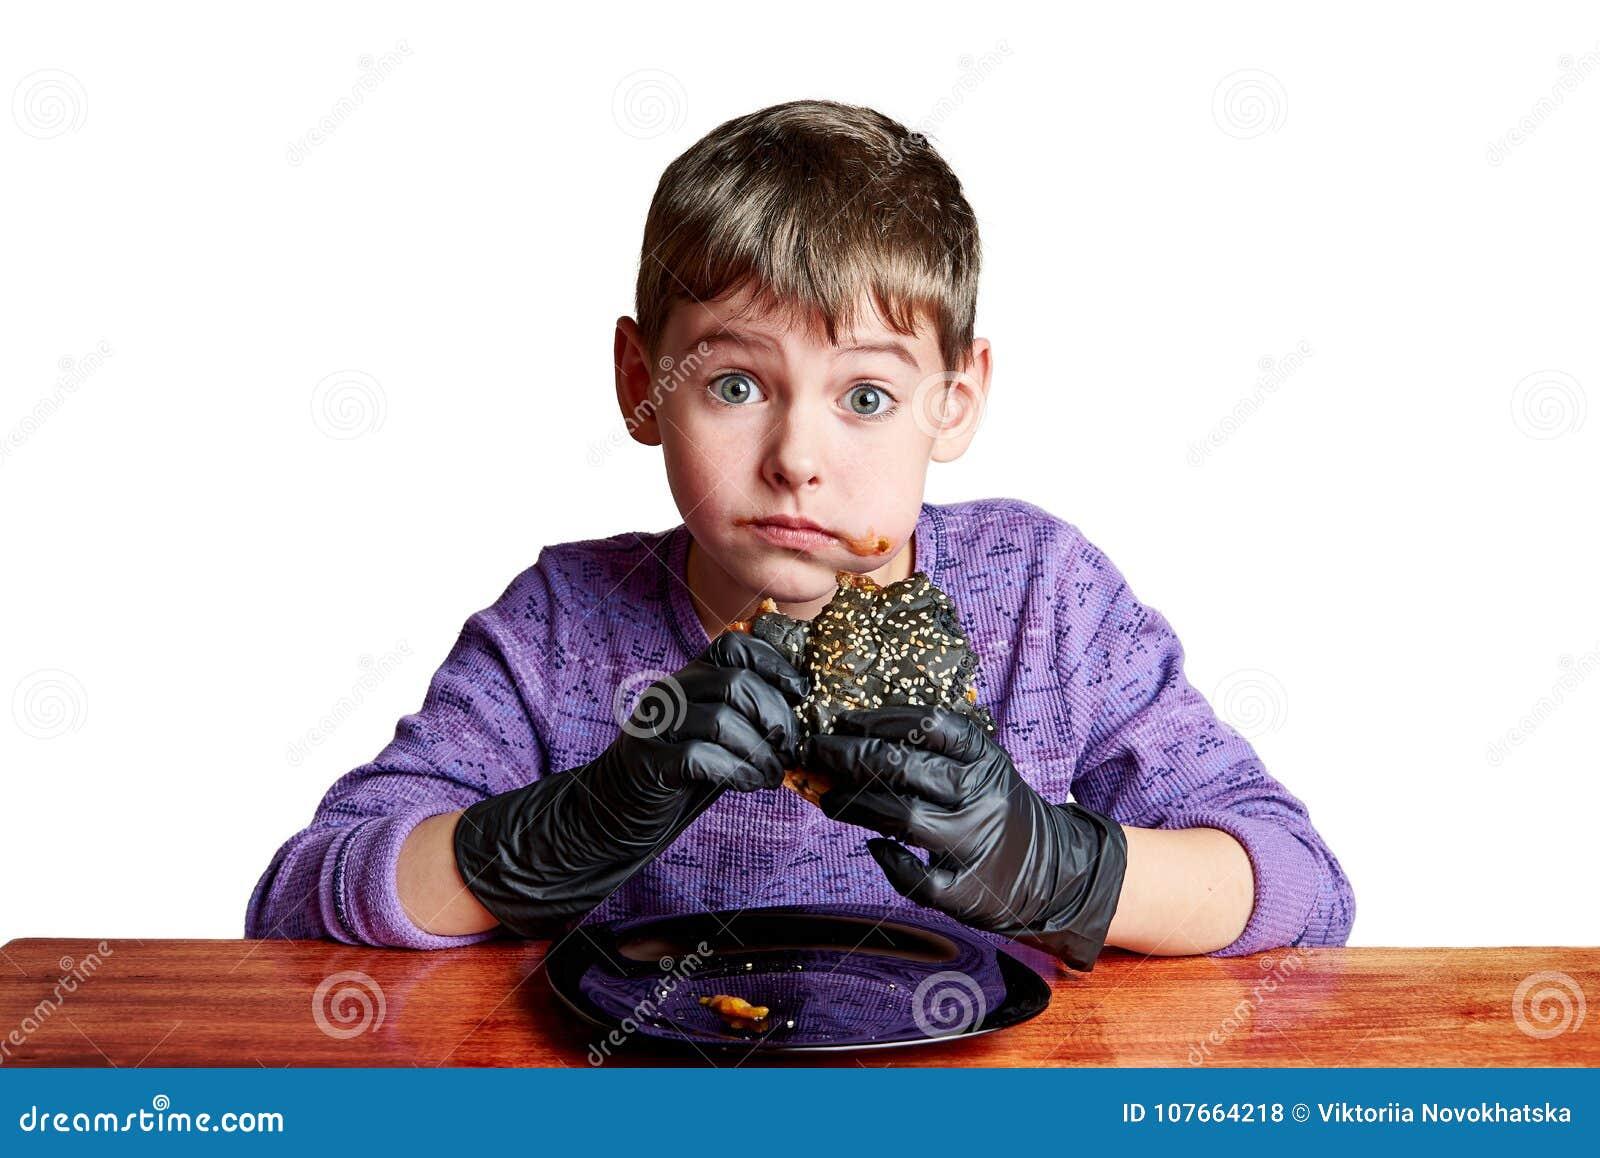 Boy in black gloves emotionally eating a burger